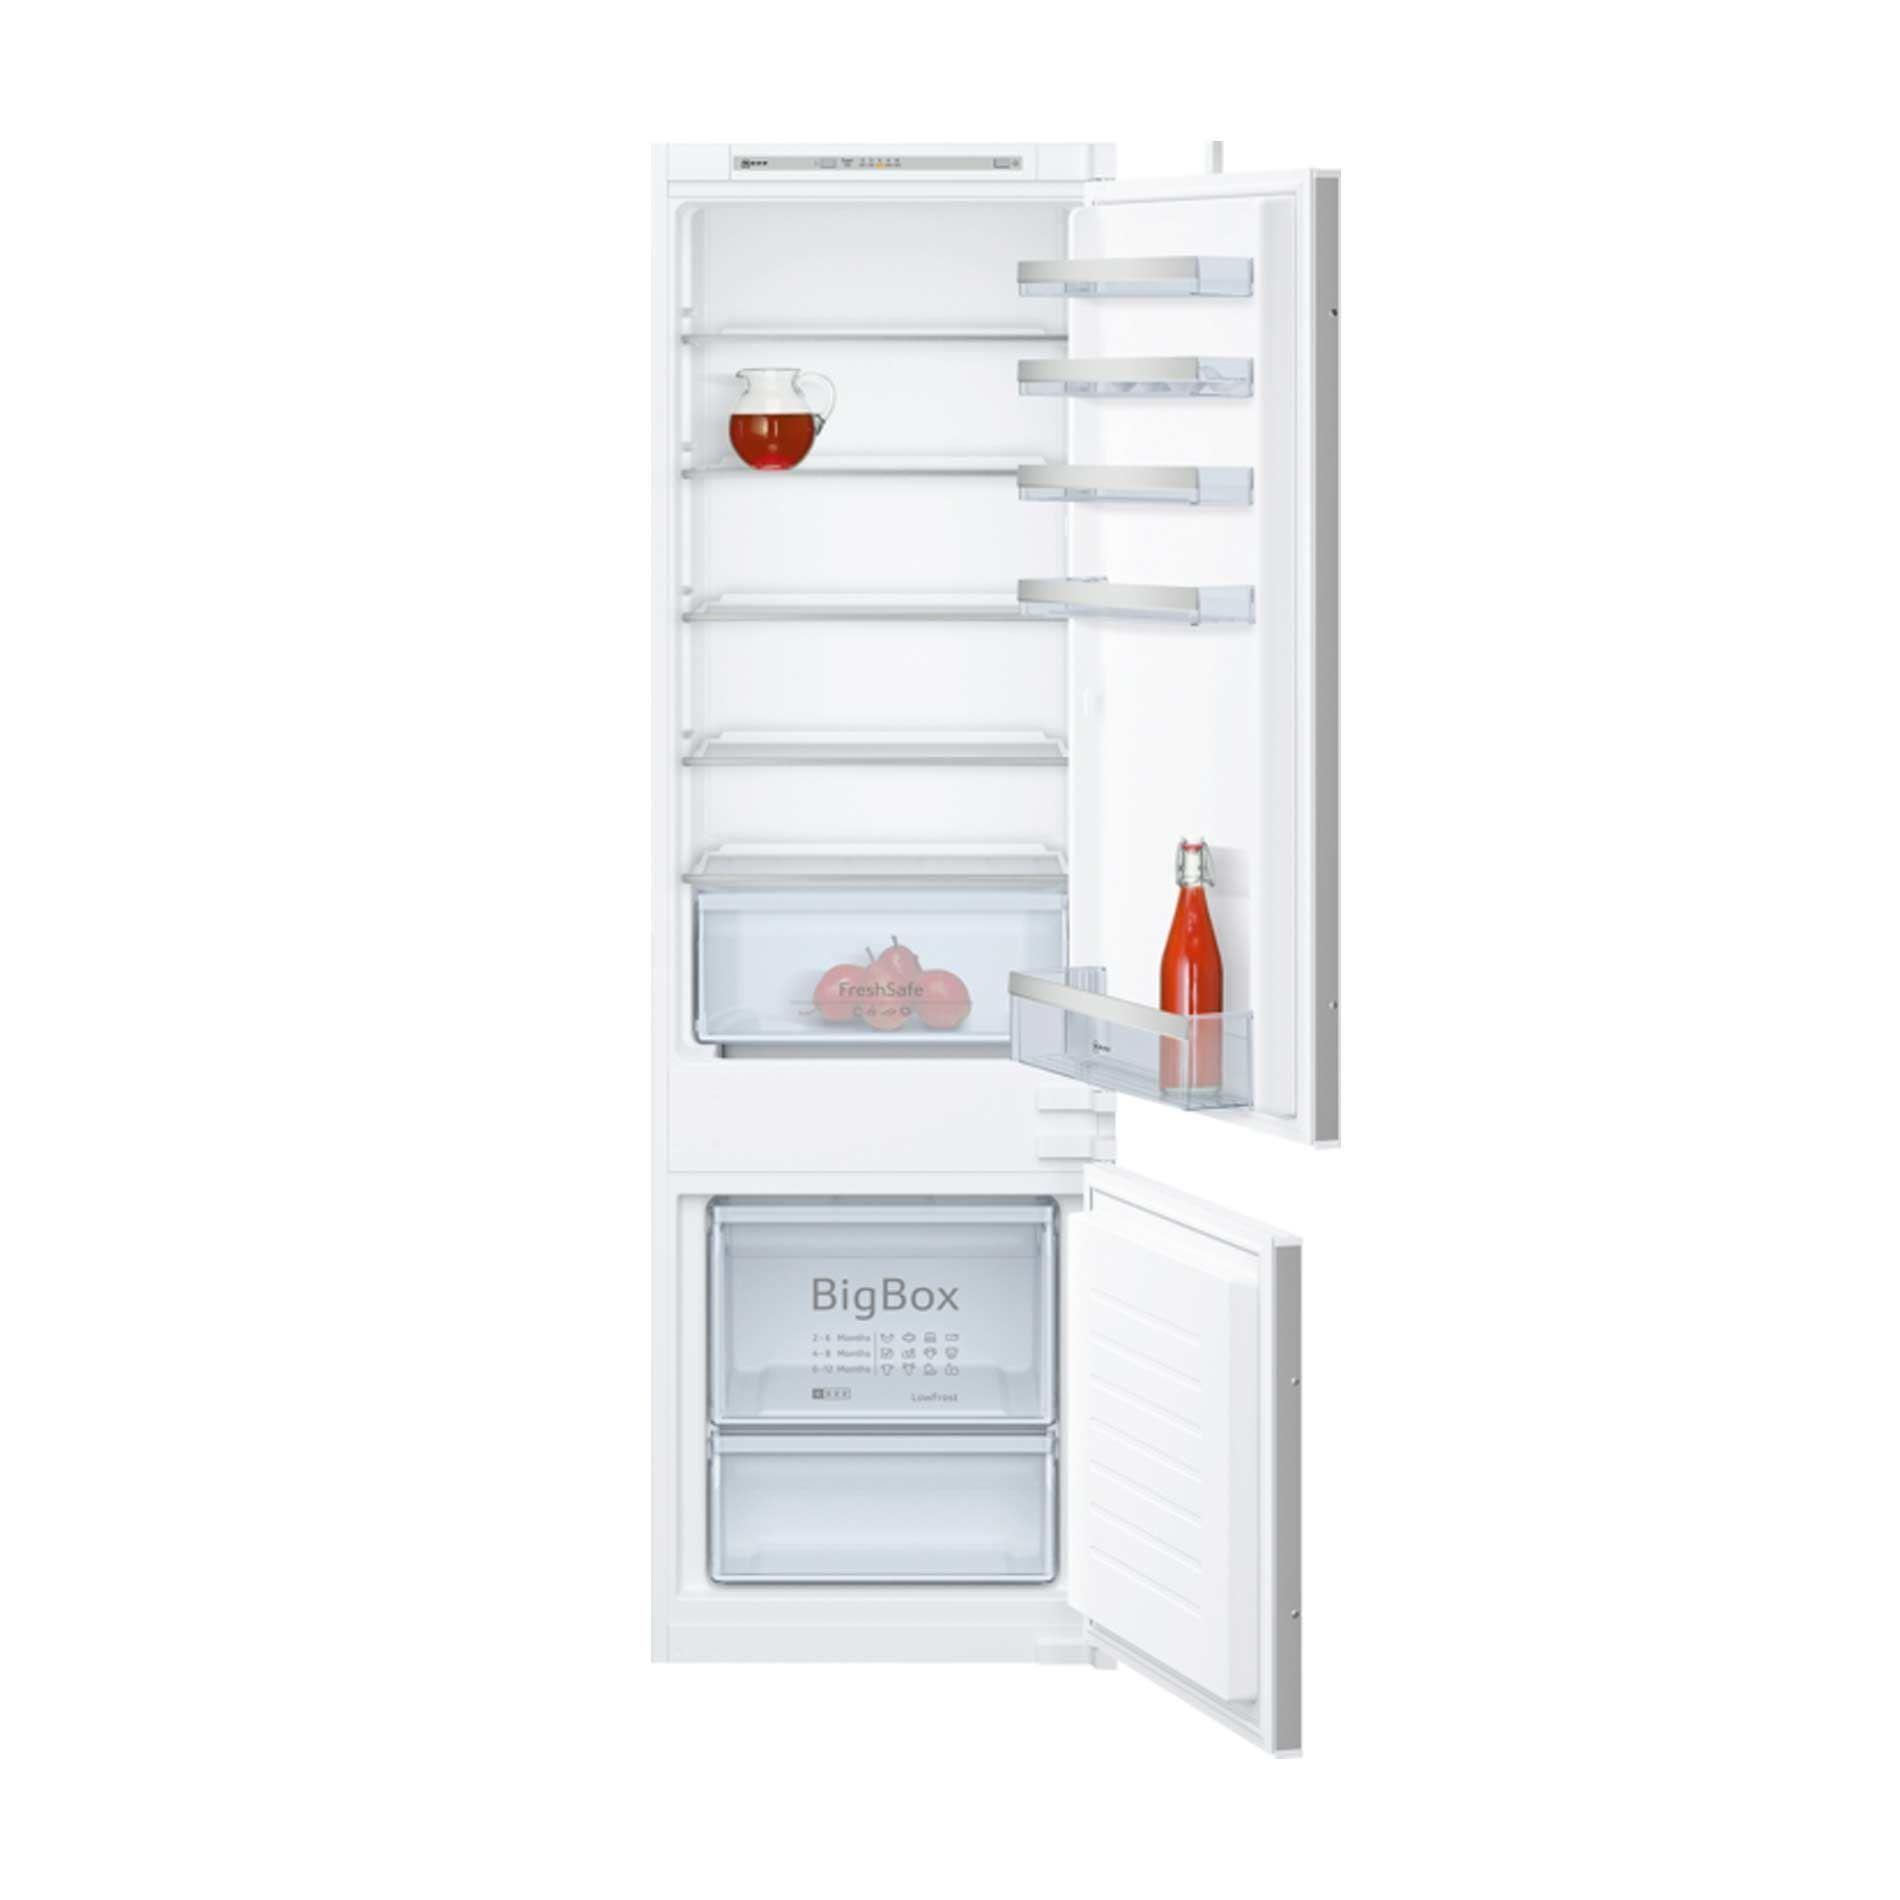 Picture of KI5872S30G Built In 7030 Fridge Freezer